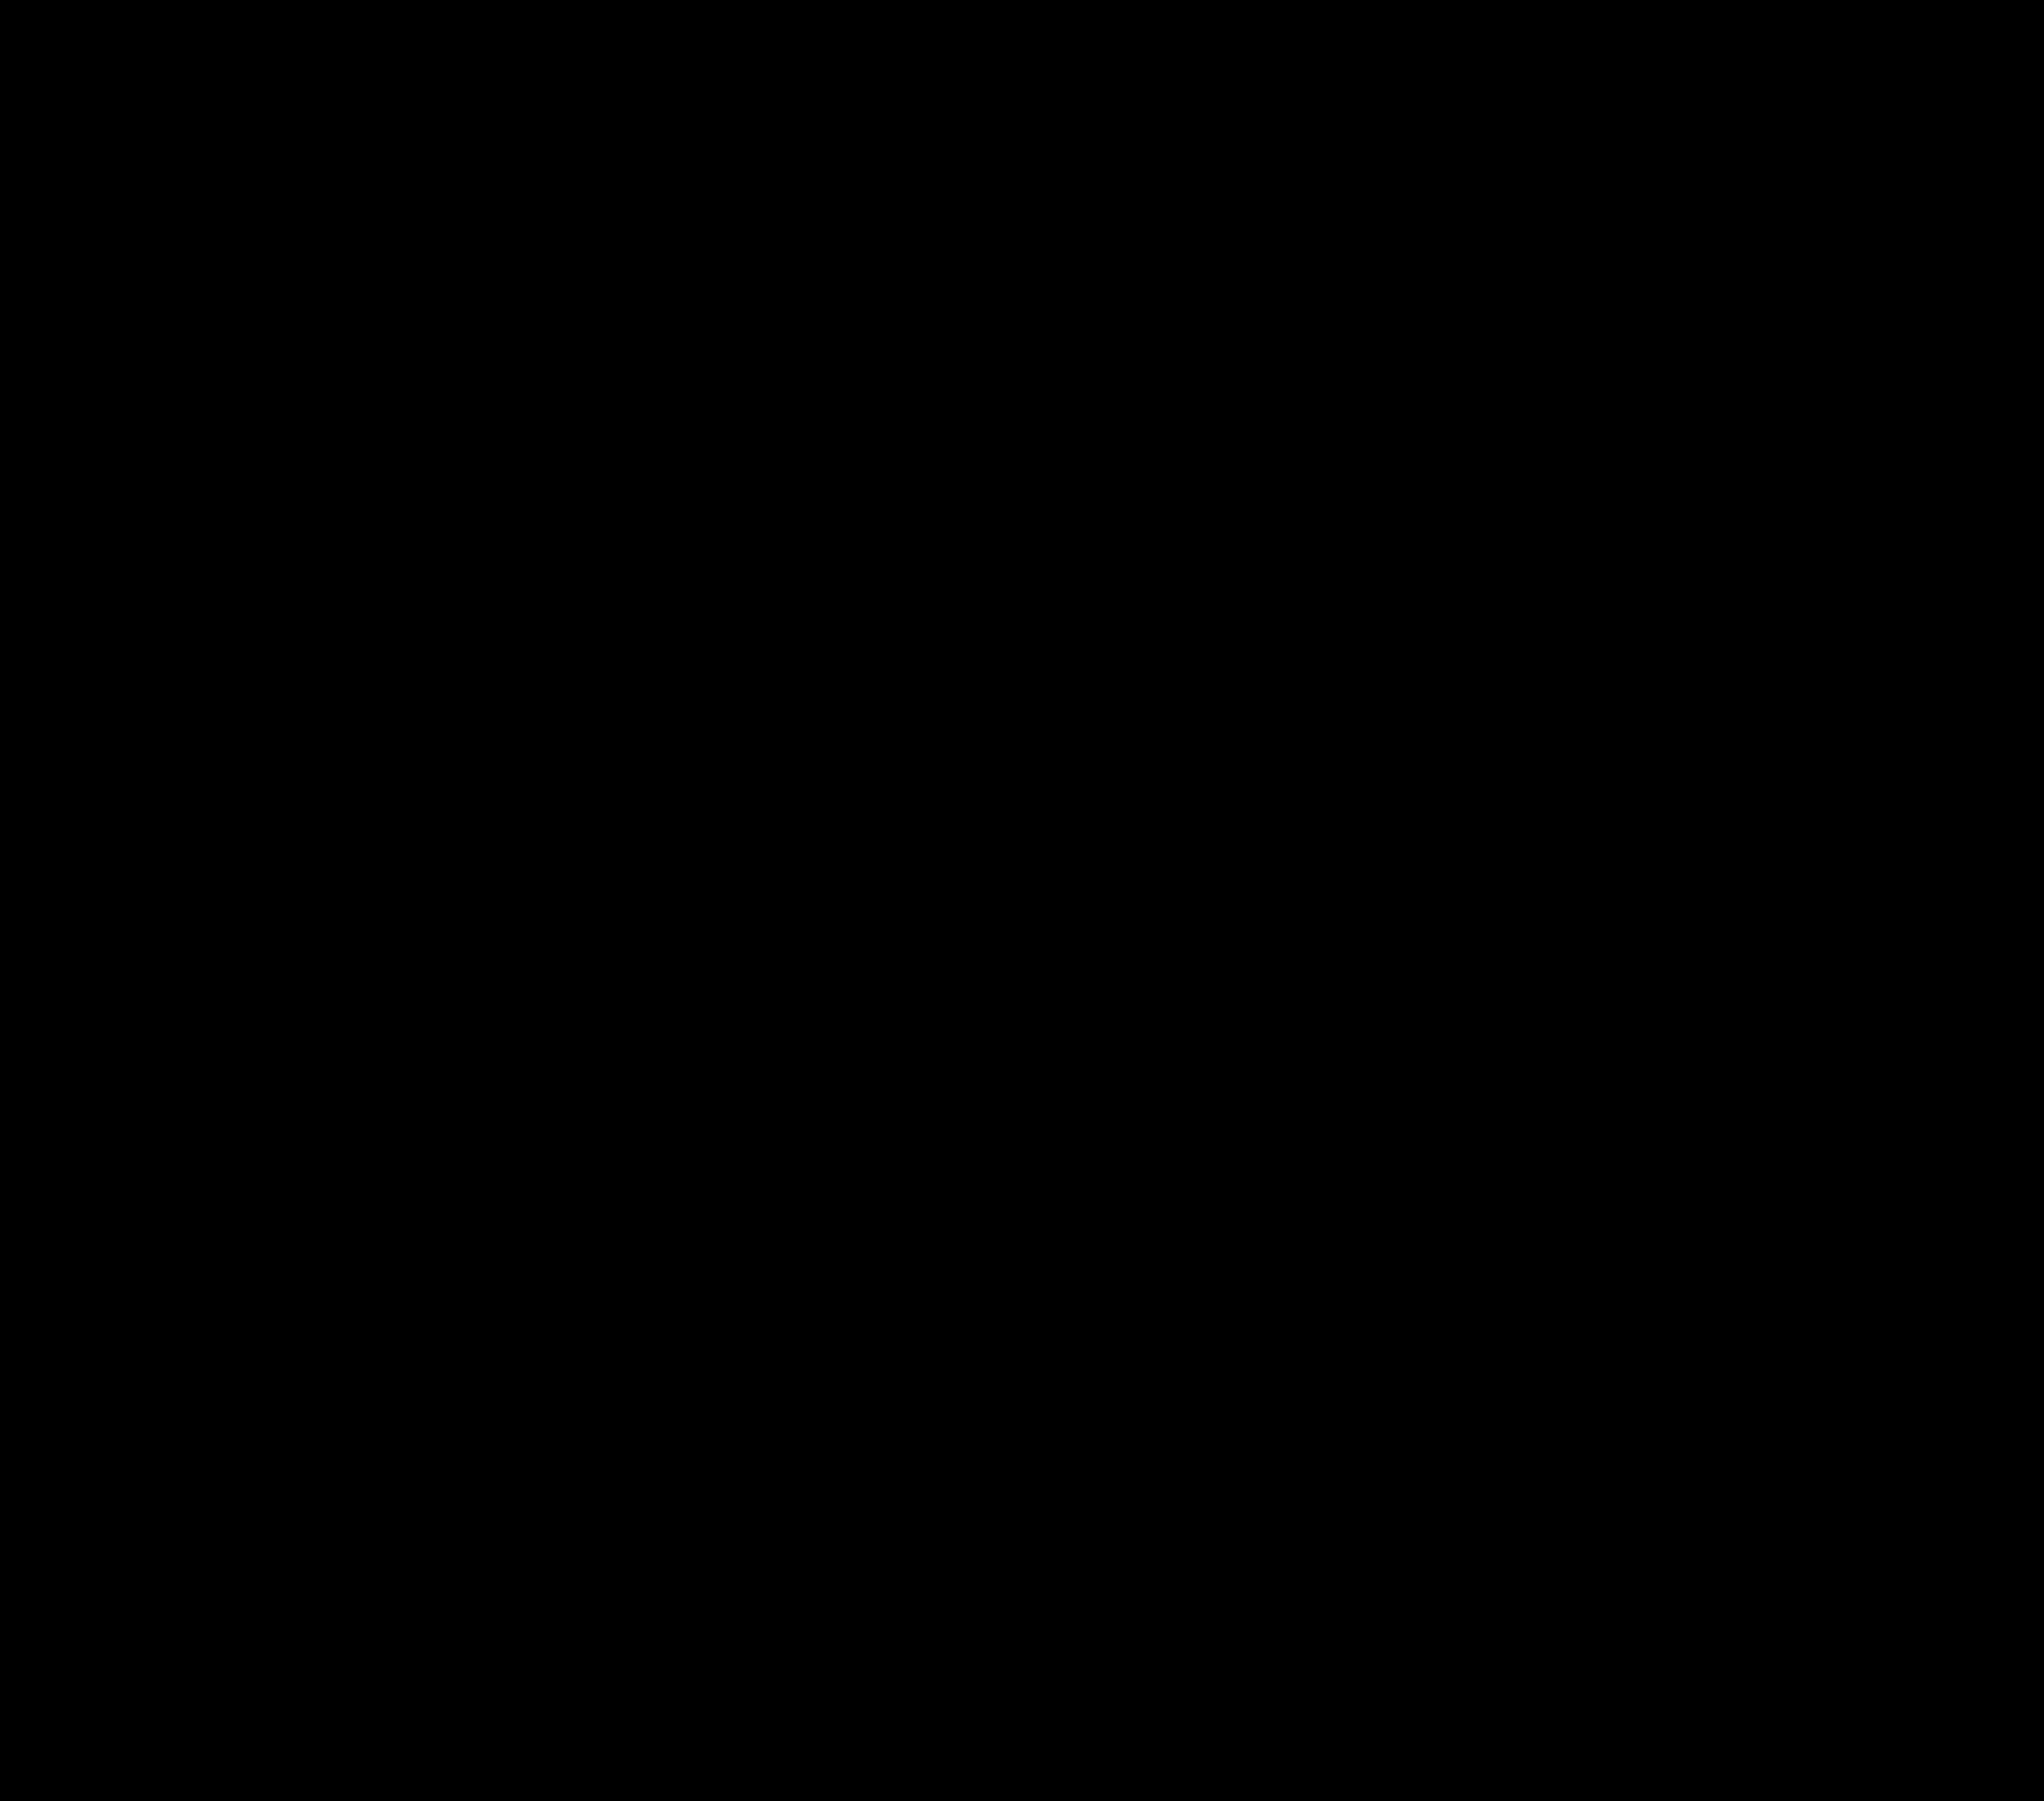 Windows Logo PNG Transparent Images.